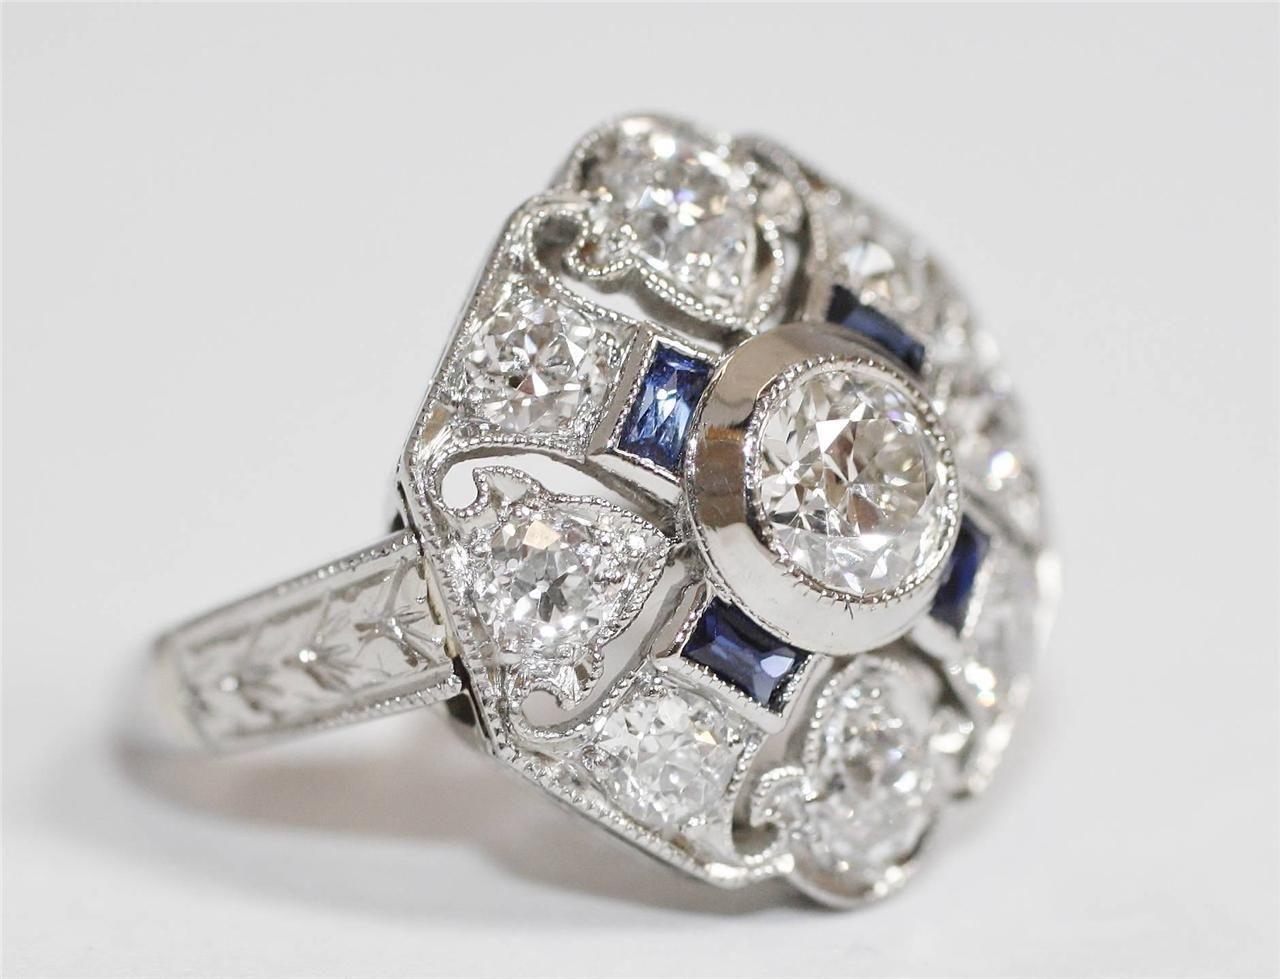 Antique Diamond Ring - Los Angeles, CA